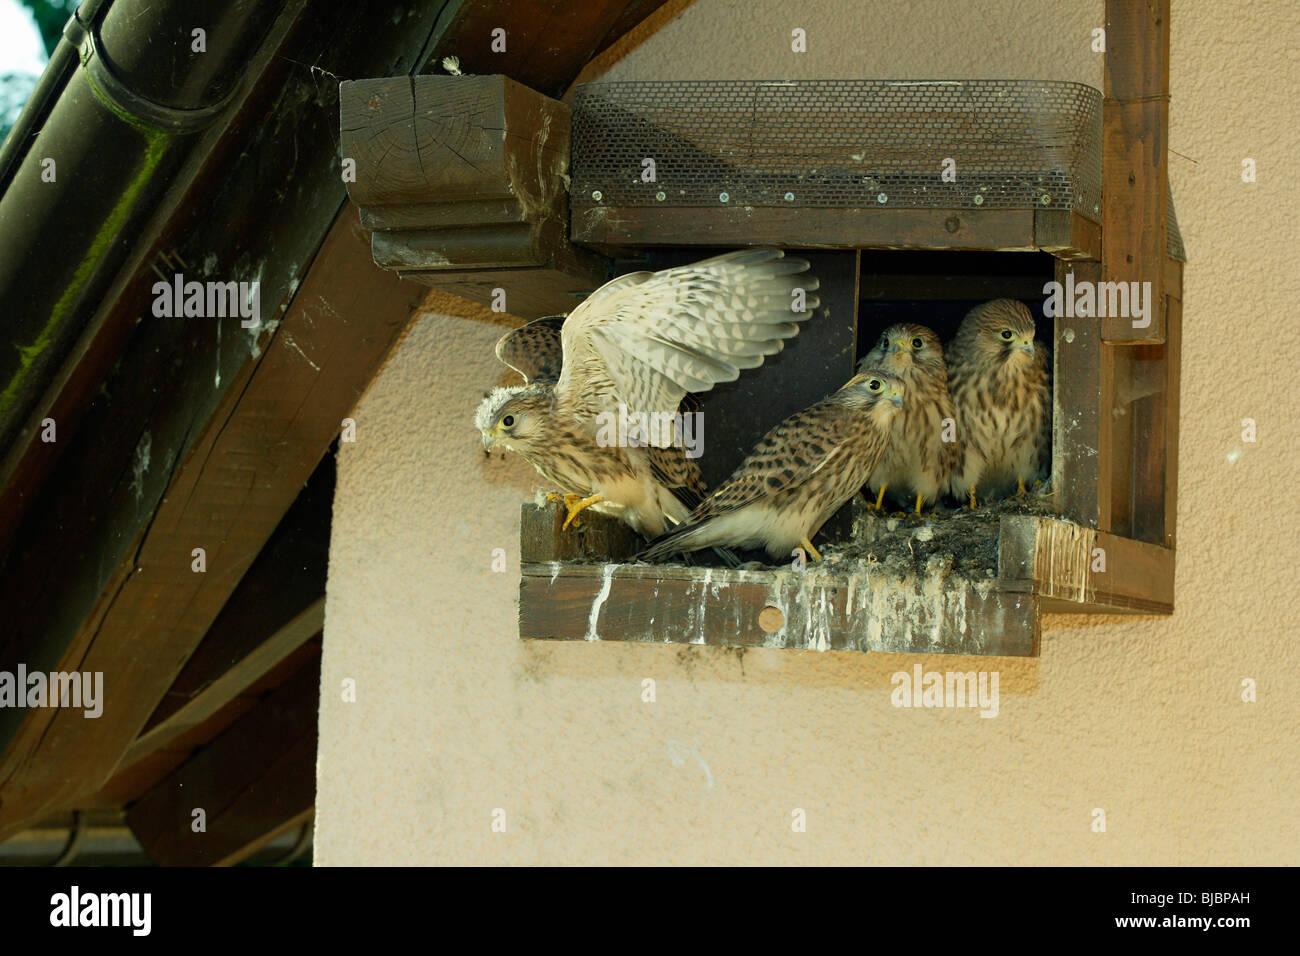 Kestrel (Falco tinnunculus), four fledglings at nest box, Germany, - Stock Image